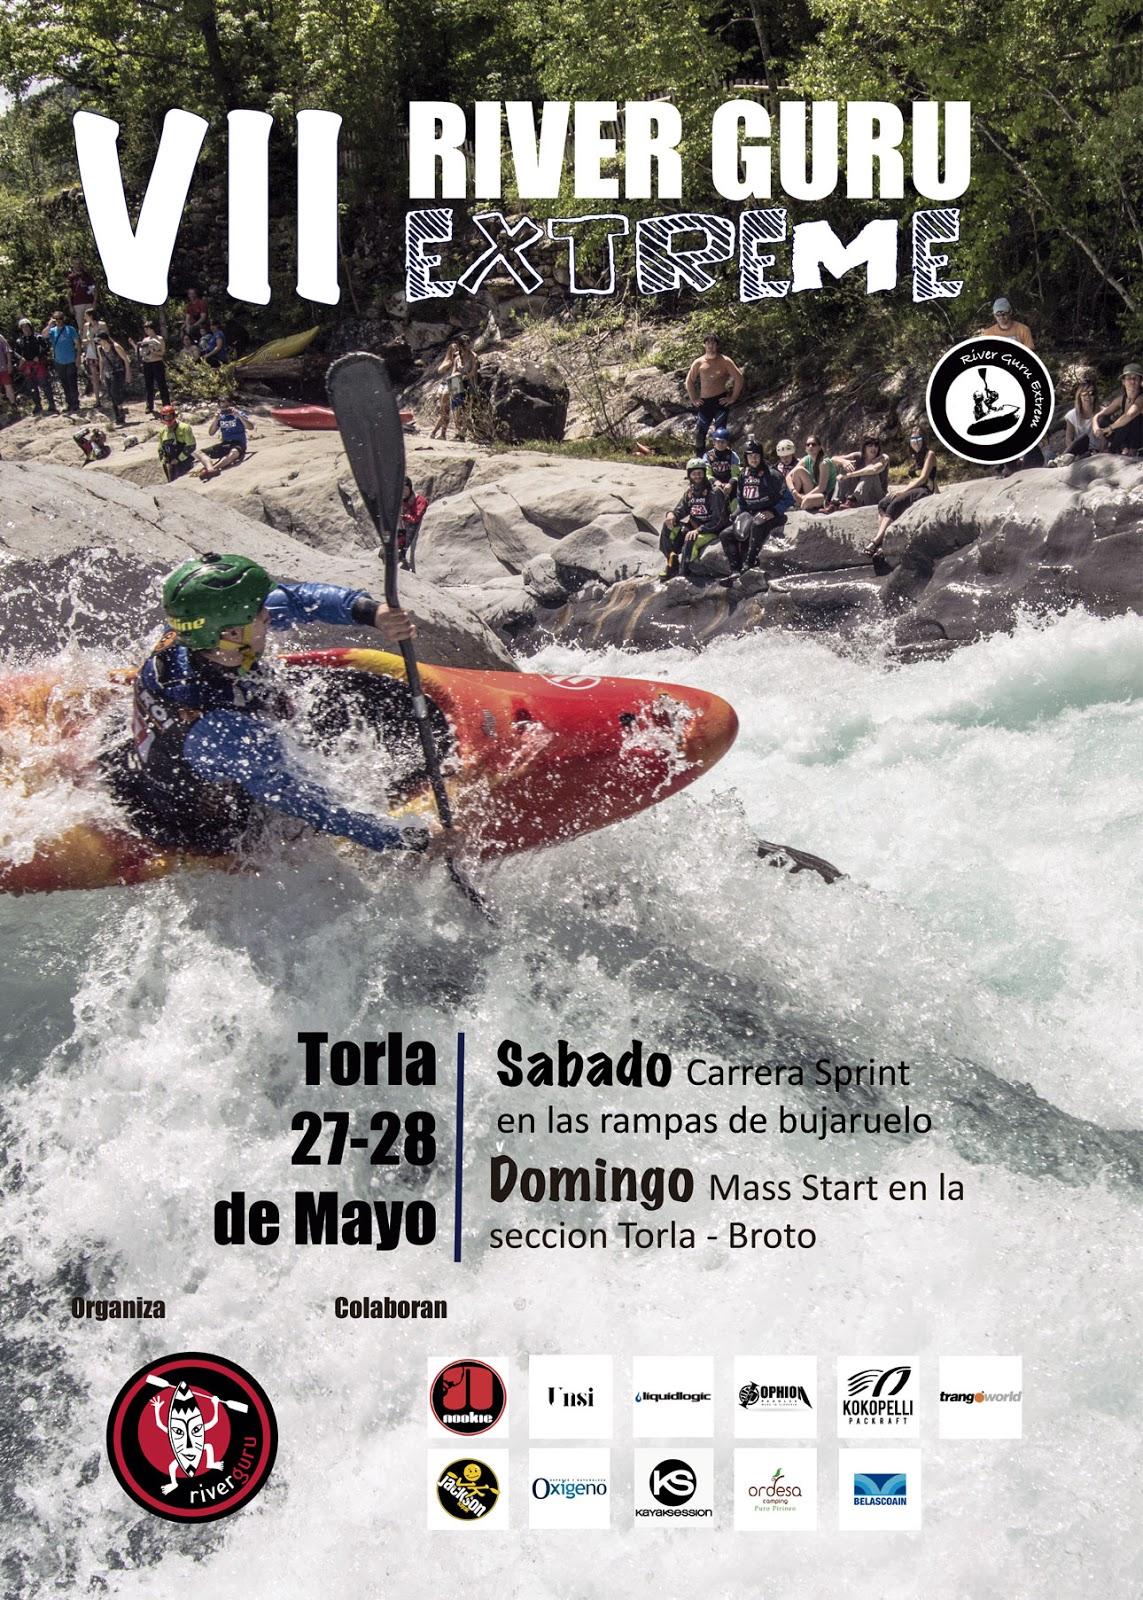 River Guru Extreme 2017